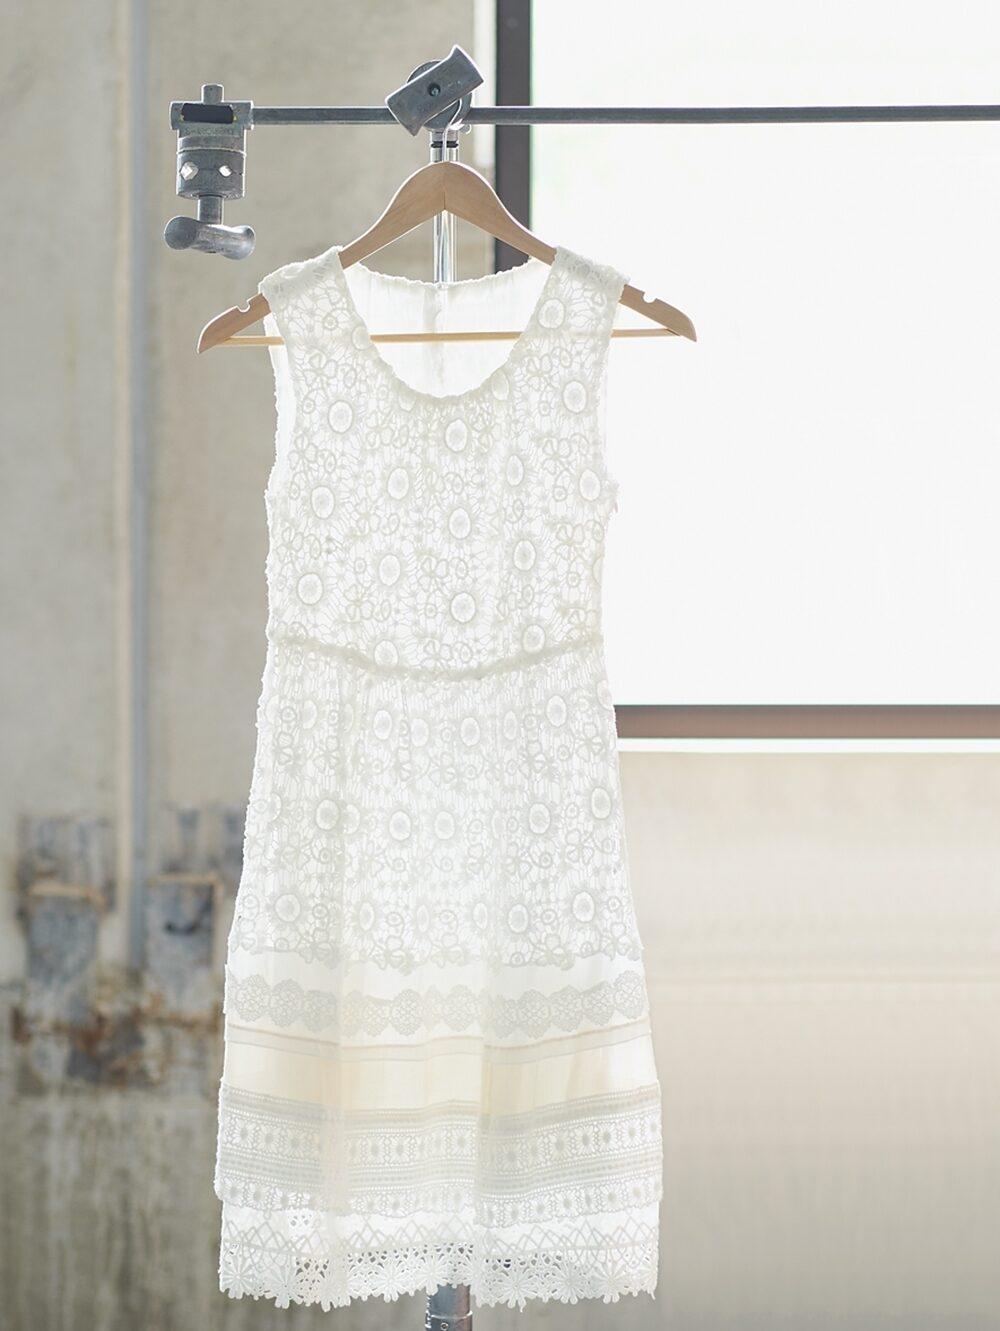 A white lace dress waits on a hanger.